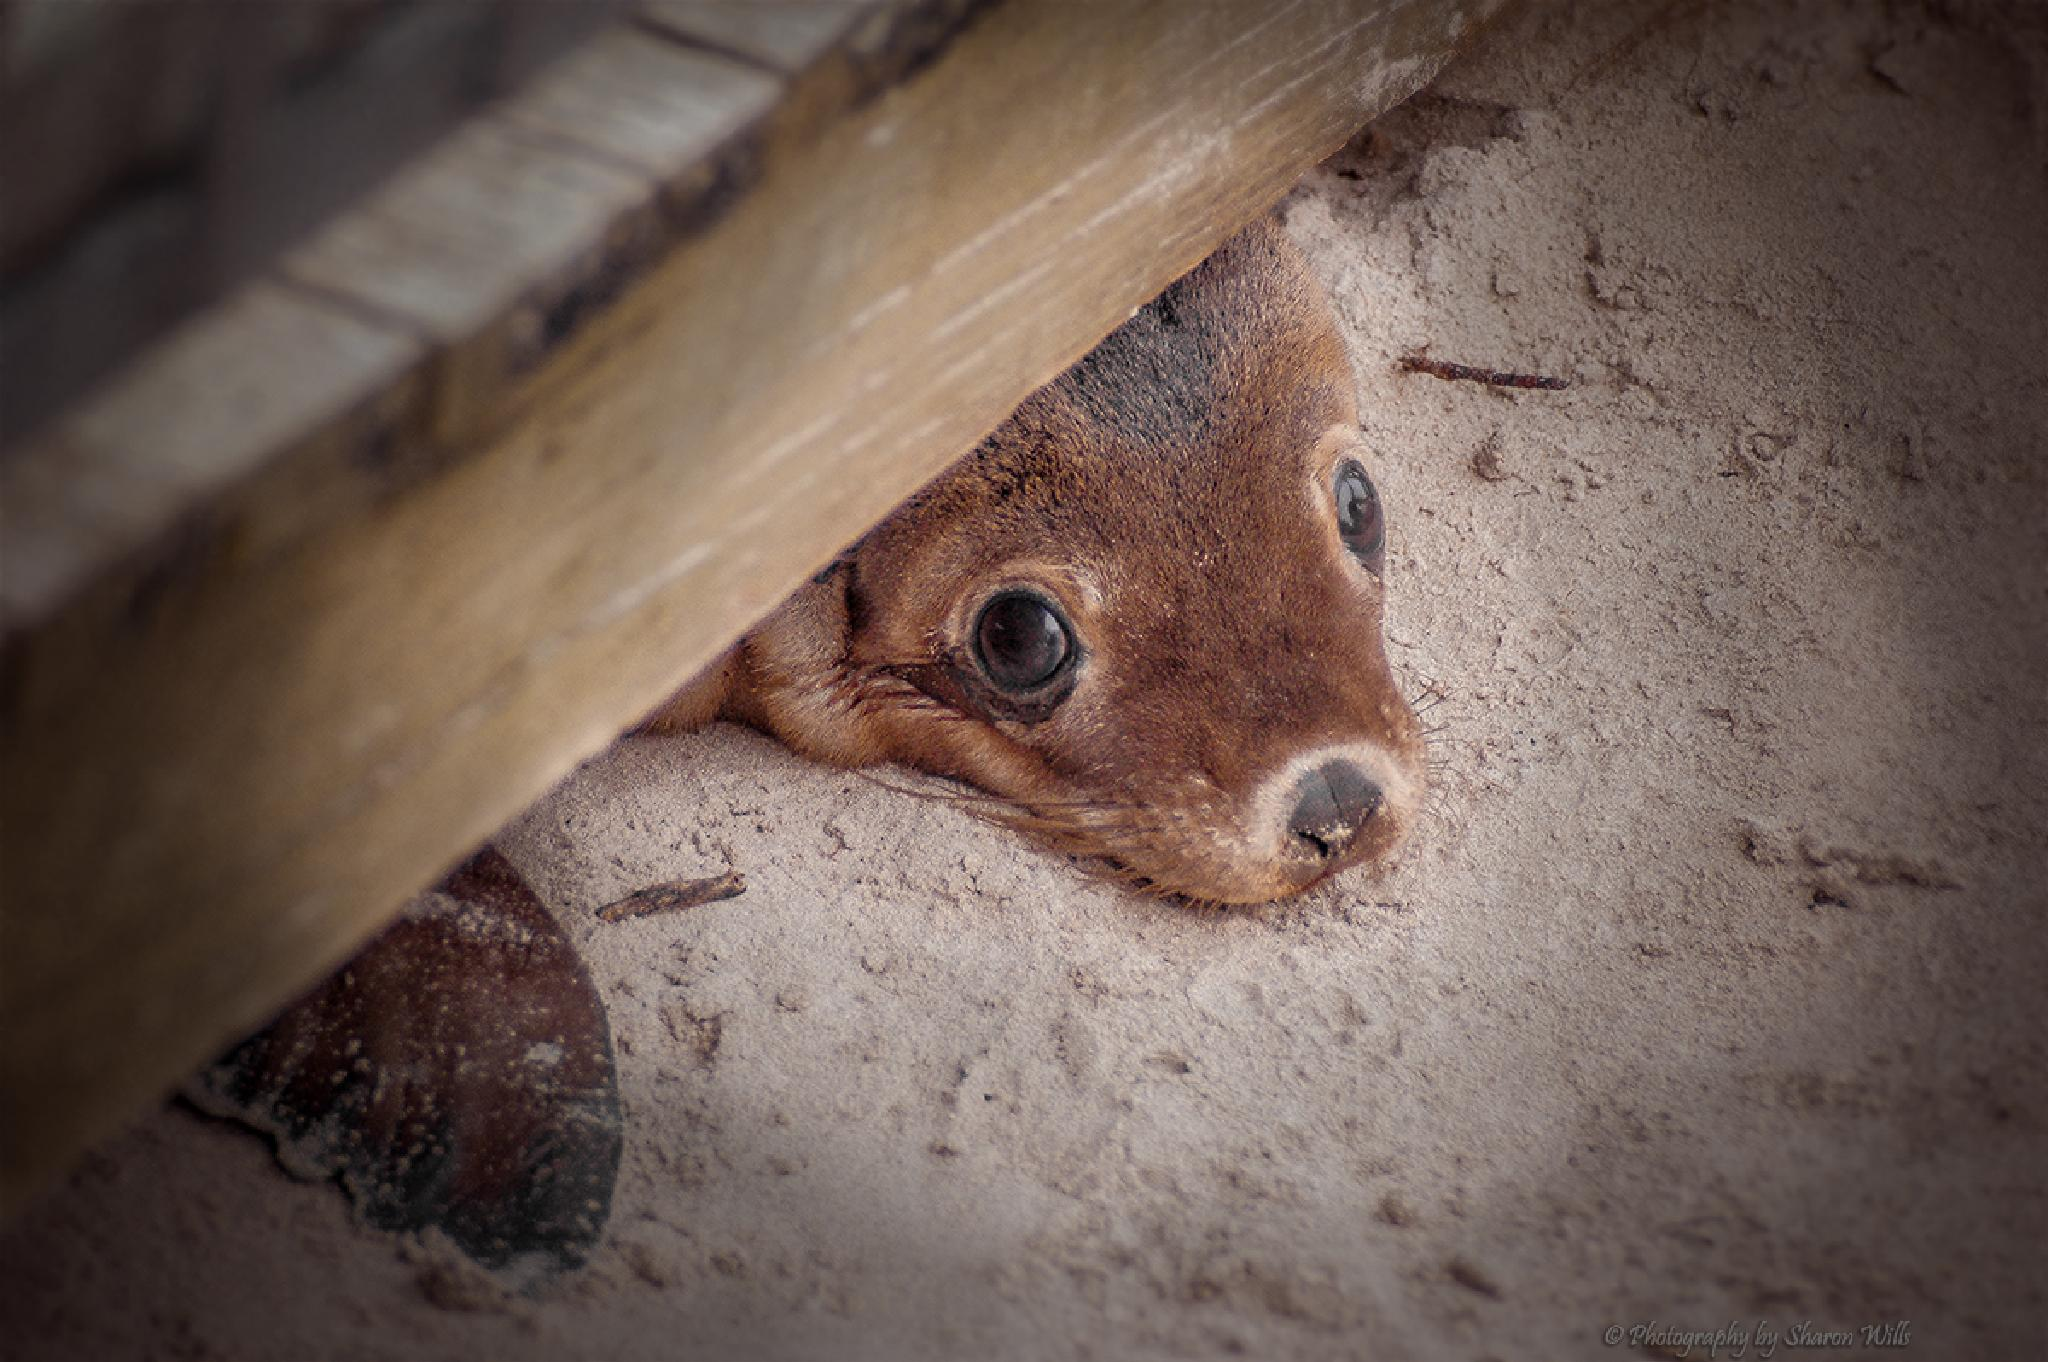 Puppy Dog Eyes by Sharon Wills